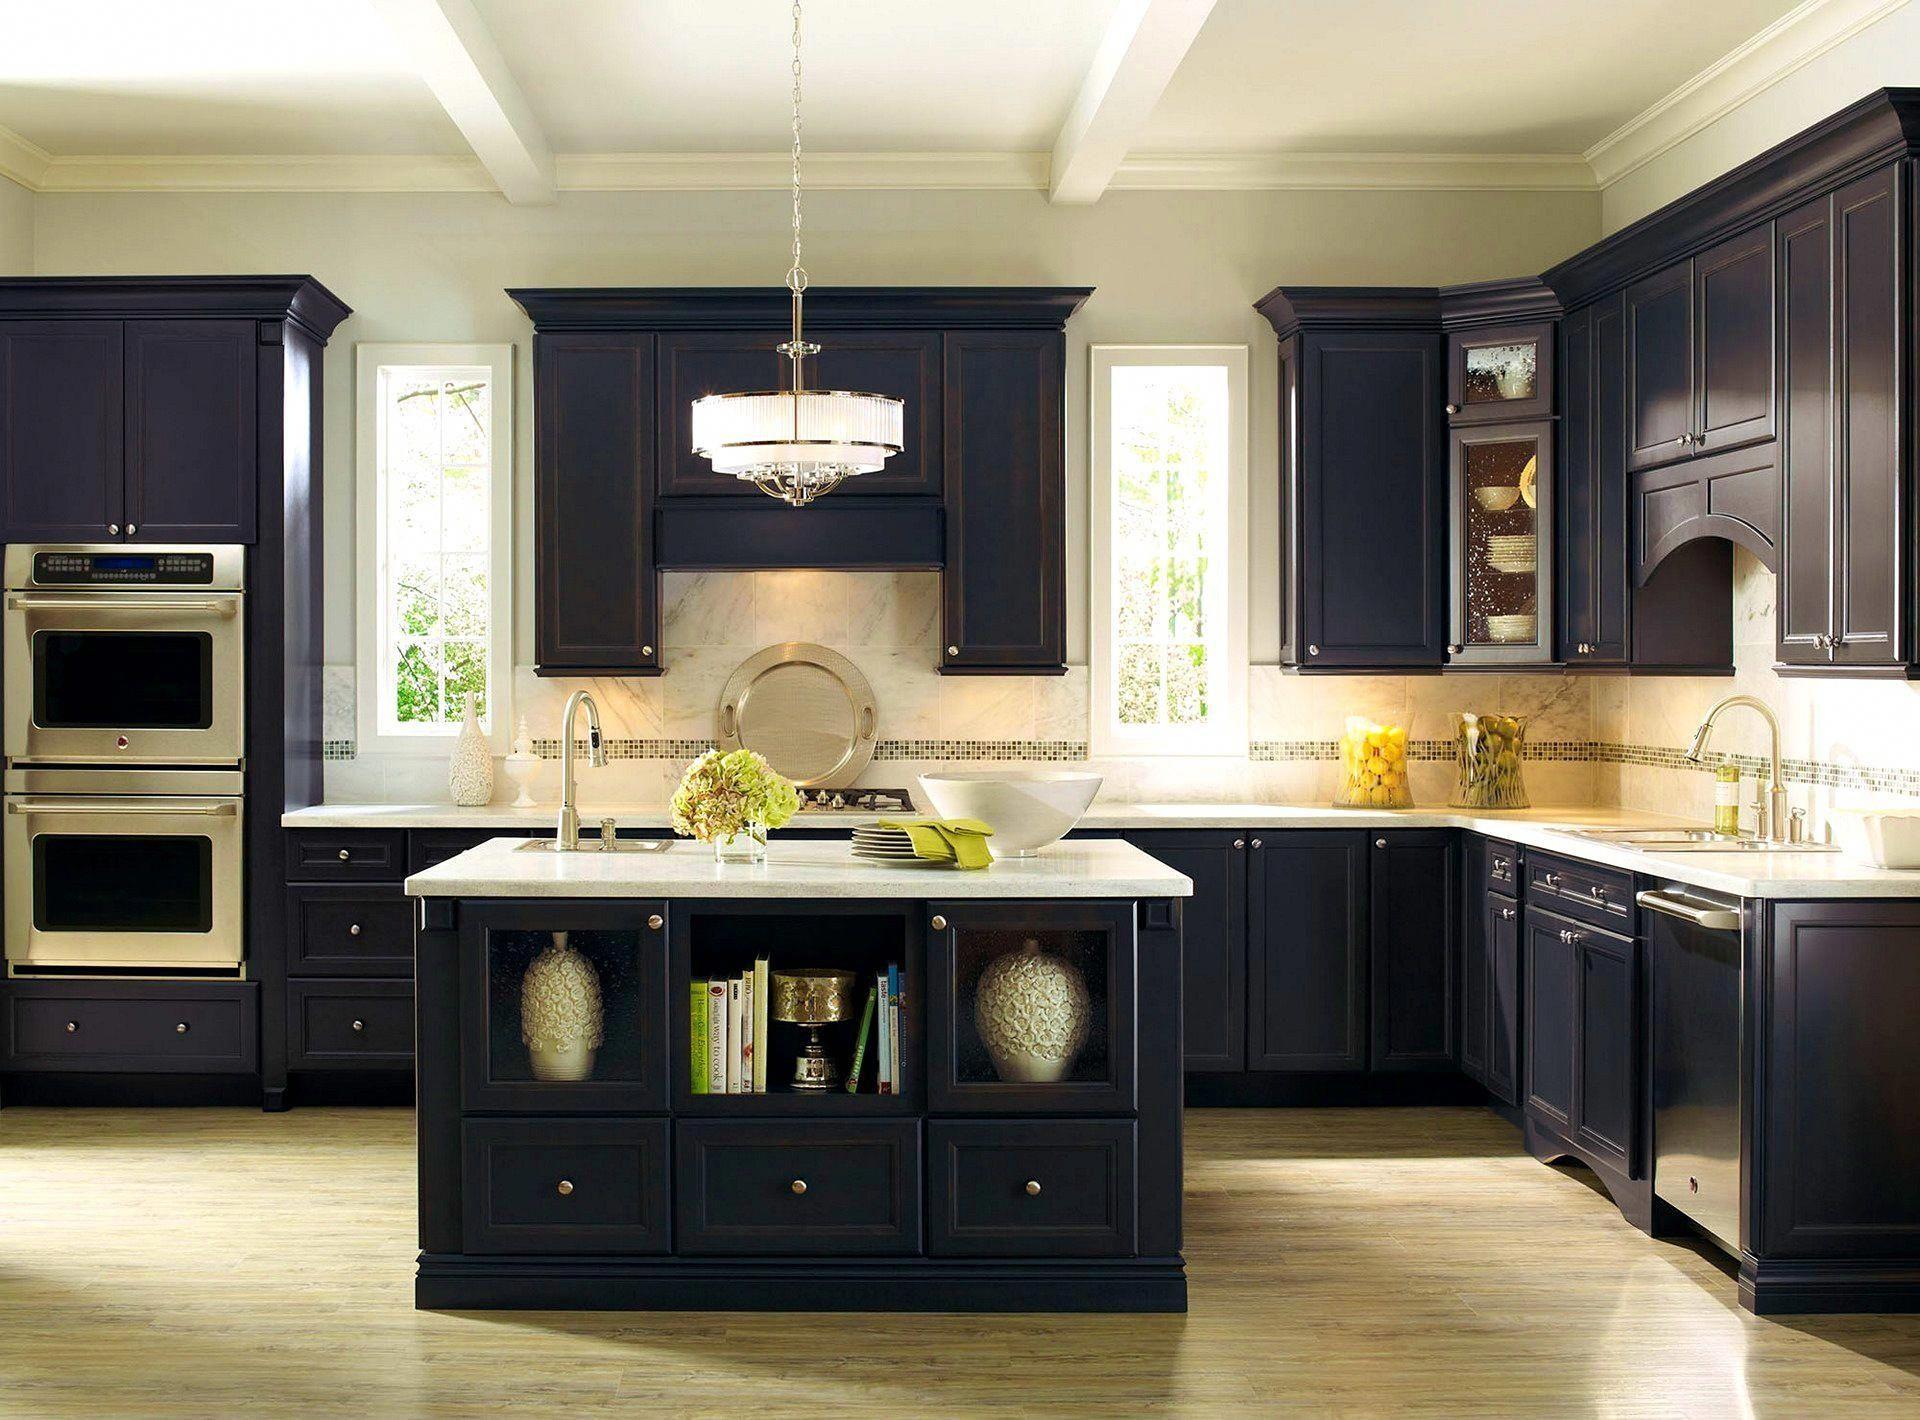 Home Appliances Repair Homeappliancestogift Refferal 4544028516 Homeappliancesto Contemporary Black Kitchen Kitchen Cabinet Design Kitchen Cabinets For Sale